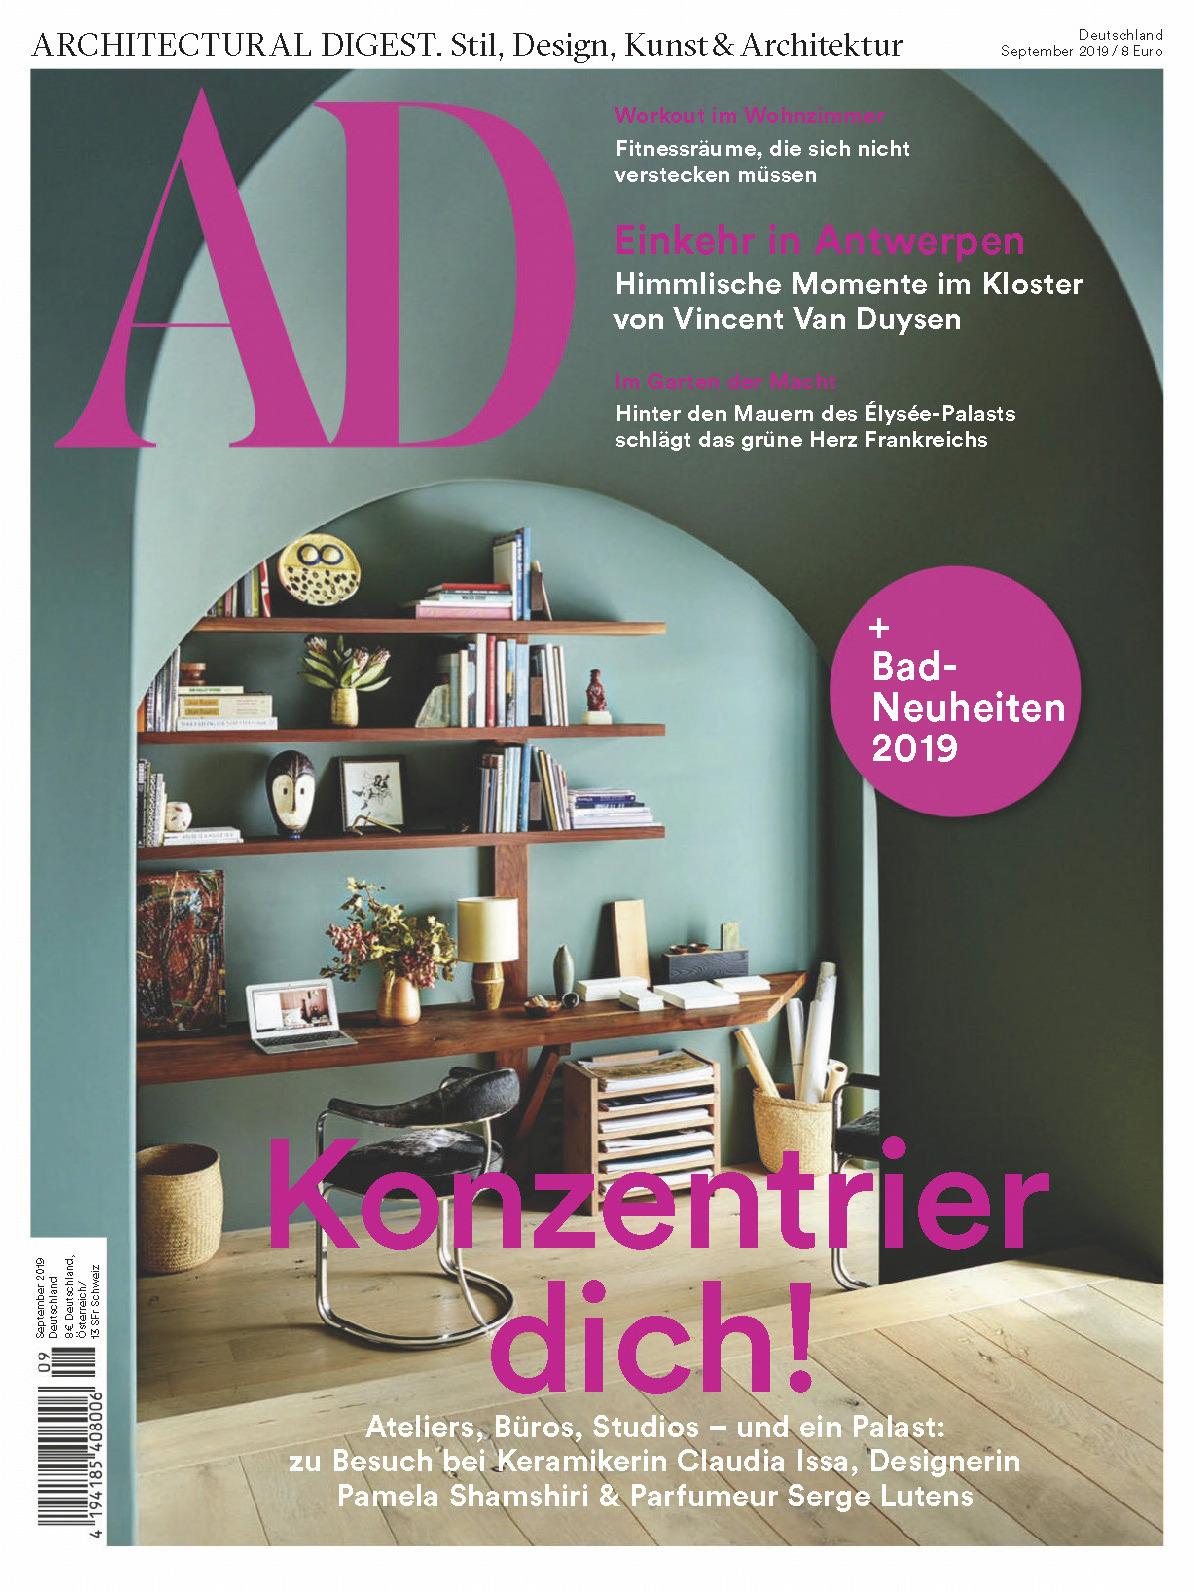 《AD》德国版室内室外设计杂志2019年09月号